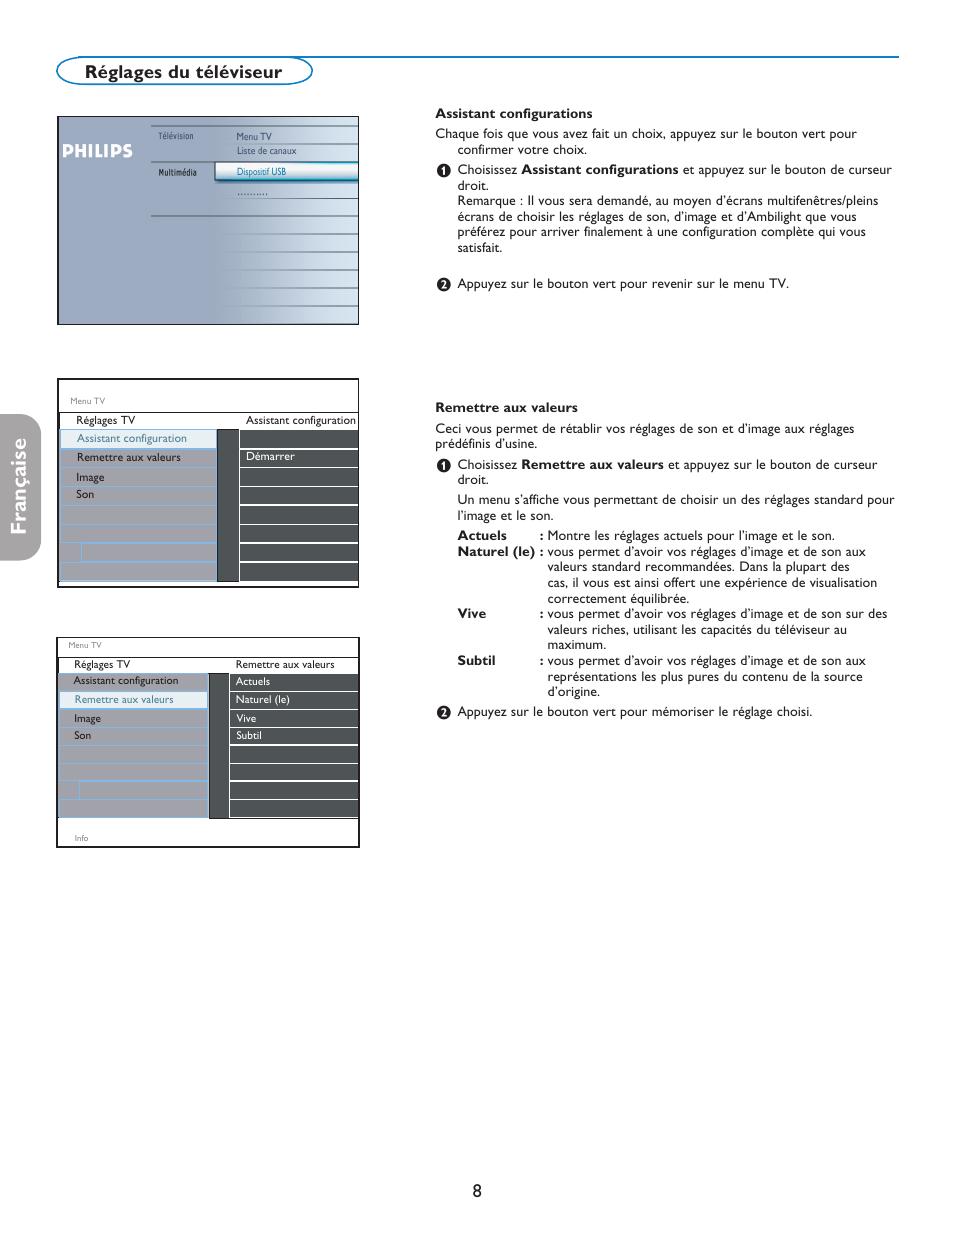 english fran aise espa ol 8r glages du t l viseur philips digital rh manualsdir com TV Manual Packet Sony Trinitron Color TV Manual